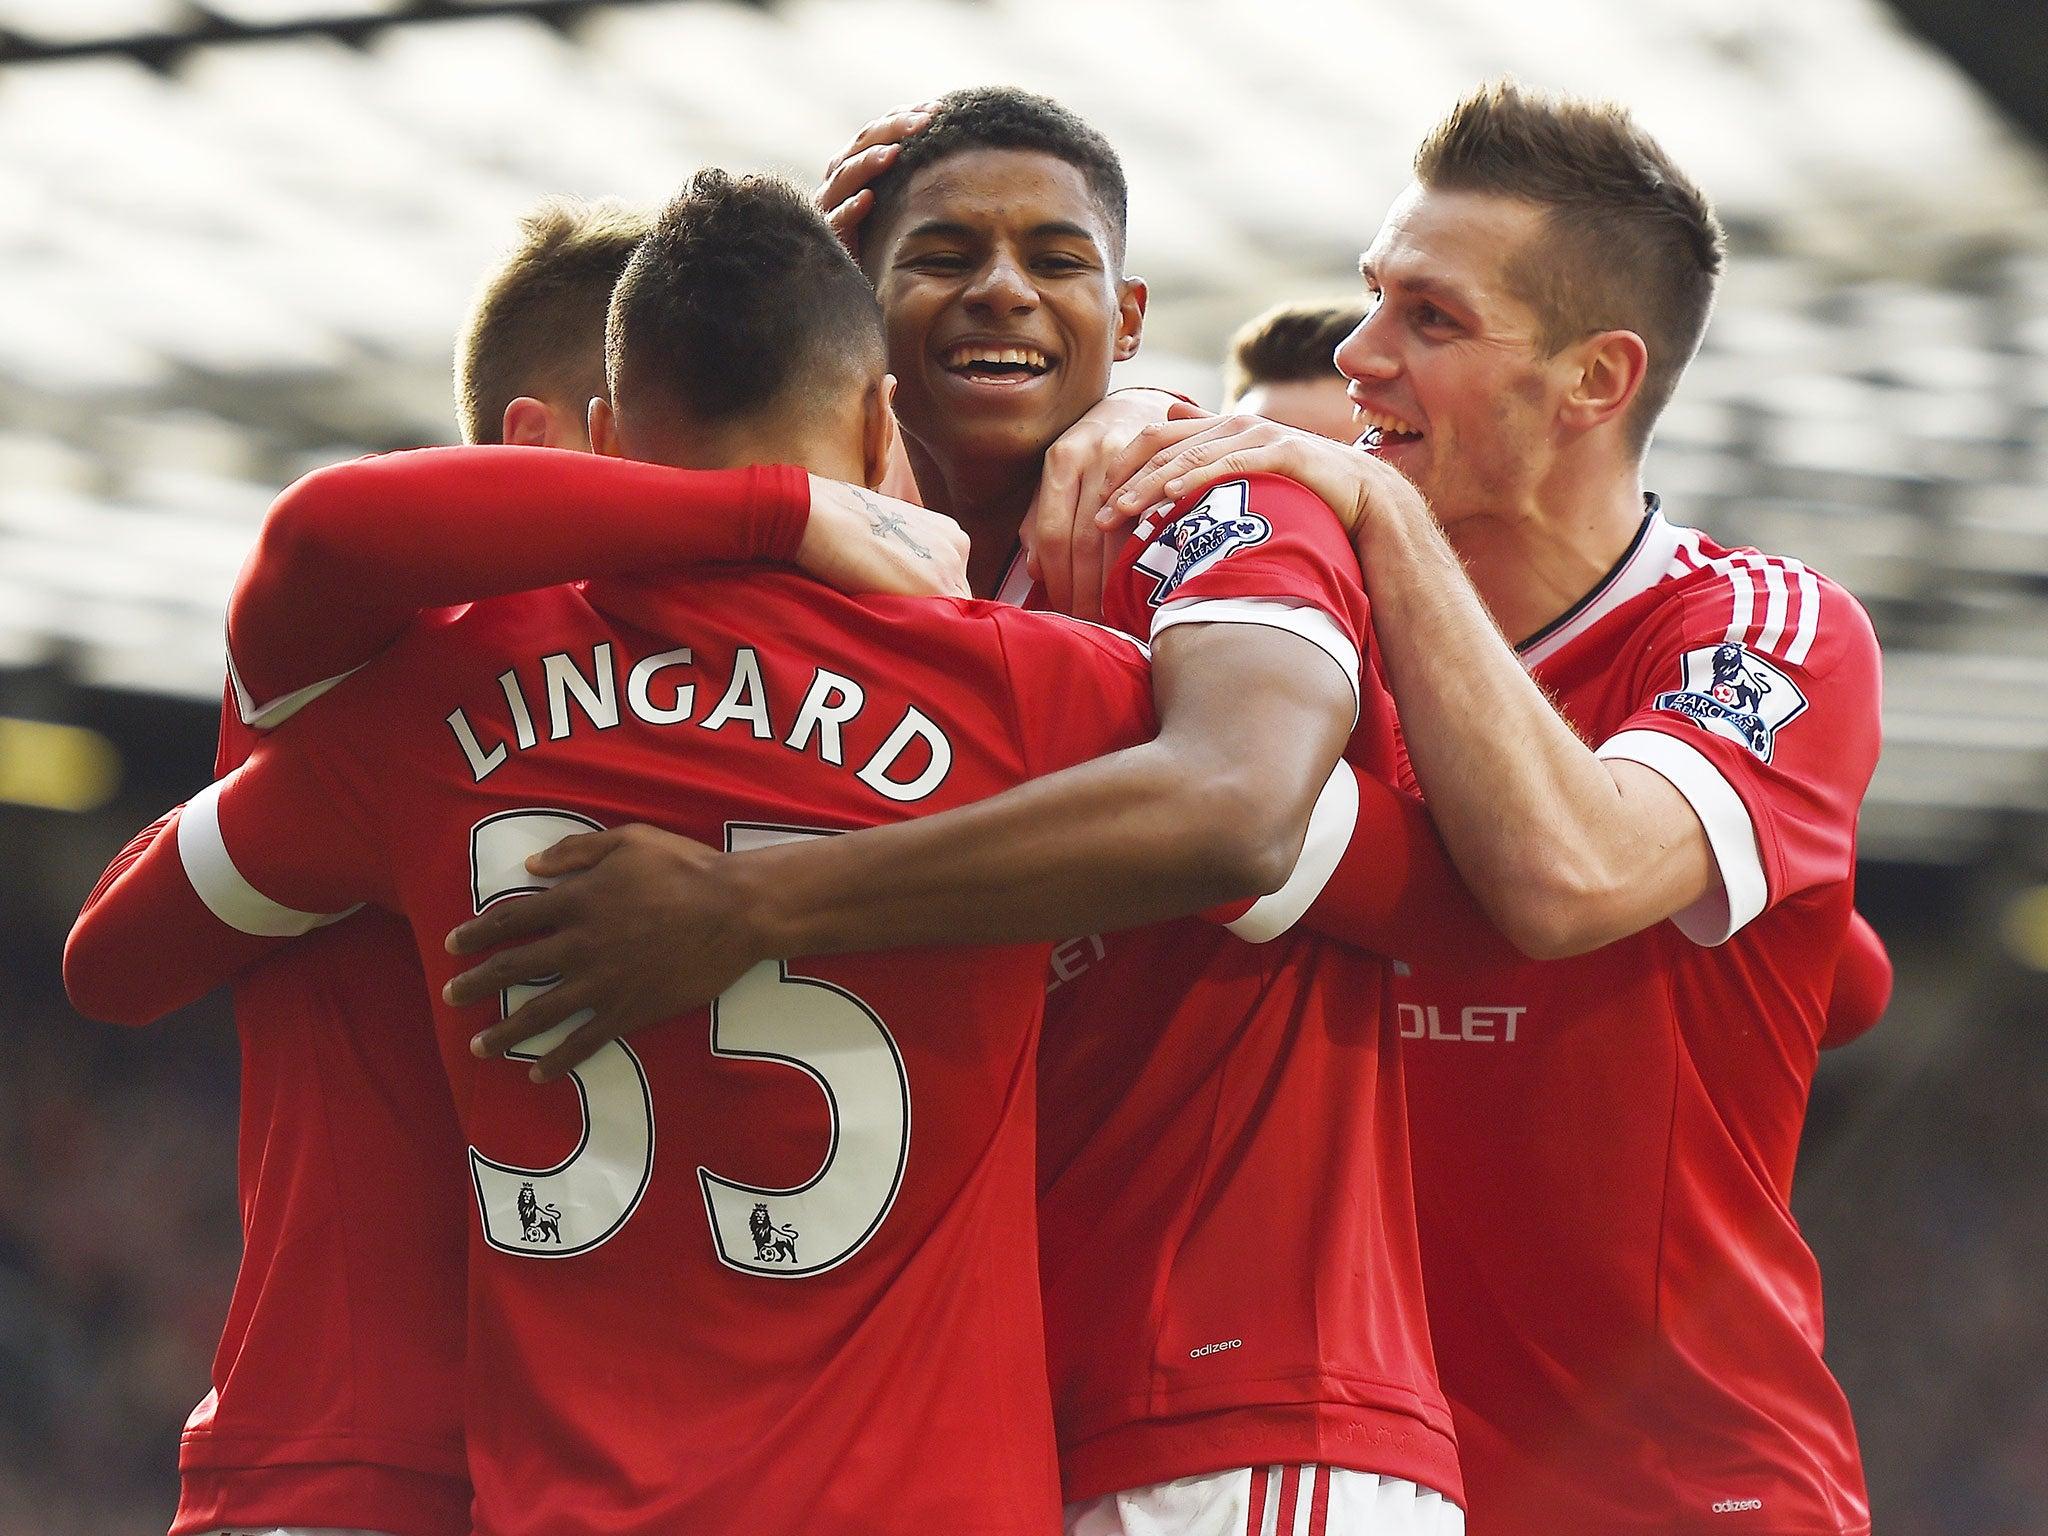 Manchester United: Marcus Rashford Has 'long Way To Go